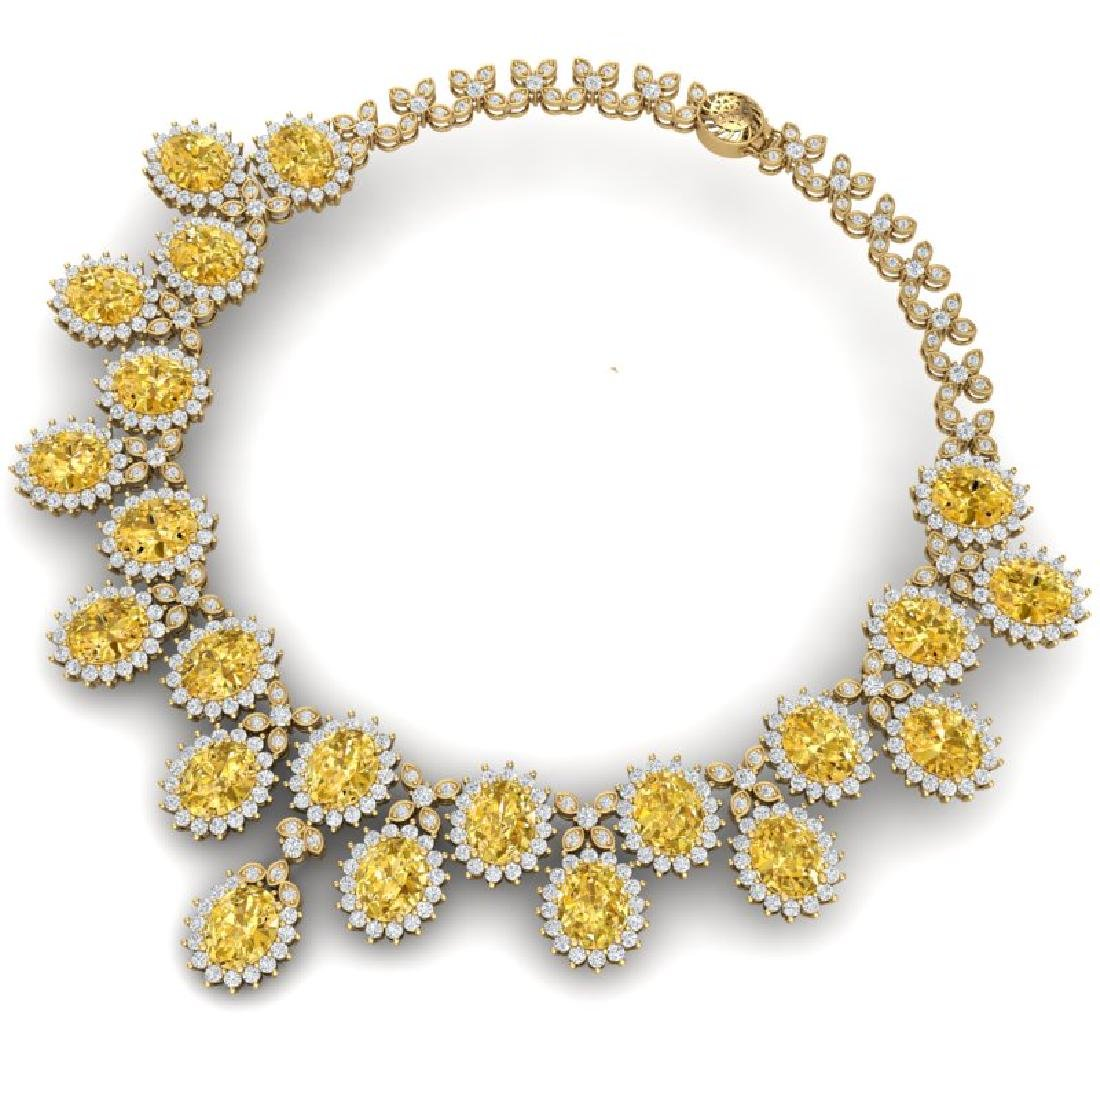 76 CTW Royalty Canary Citrine & VS Diamond Necklace 18K - 3